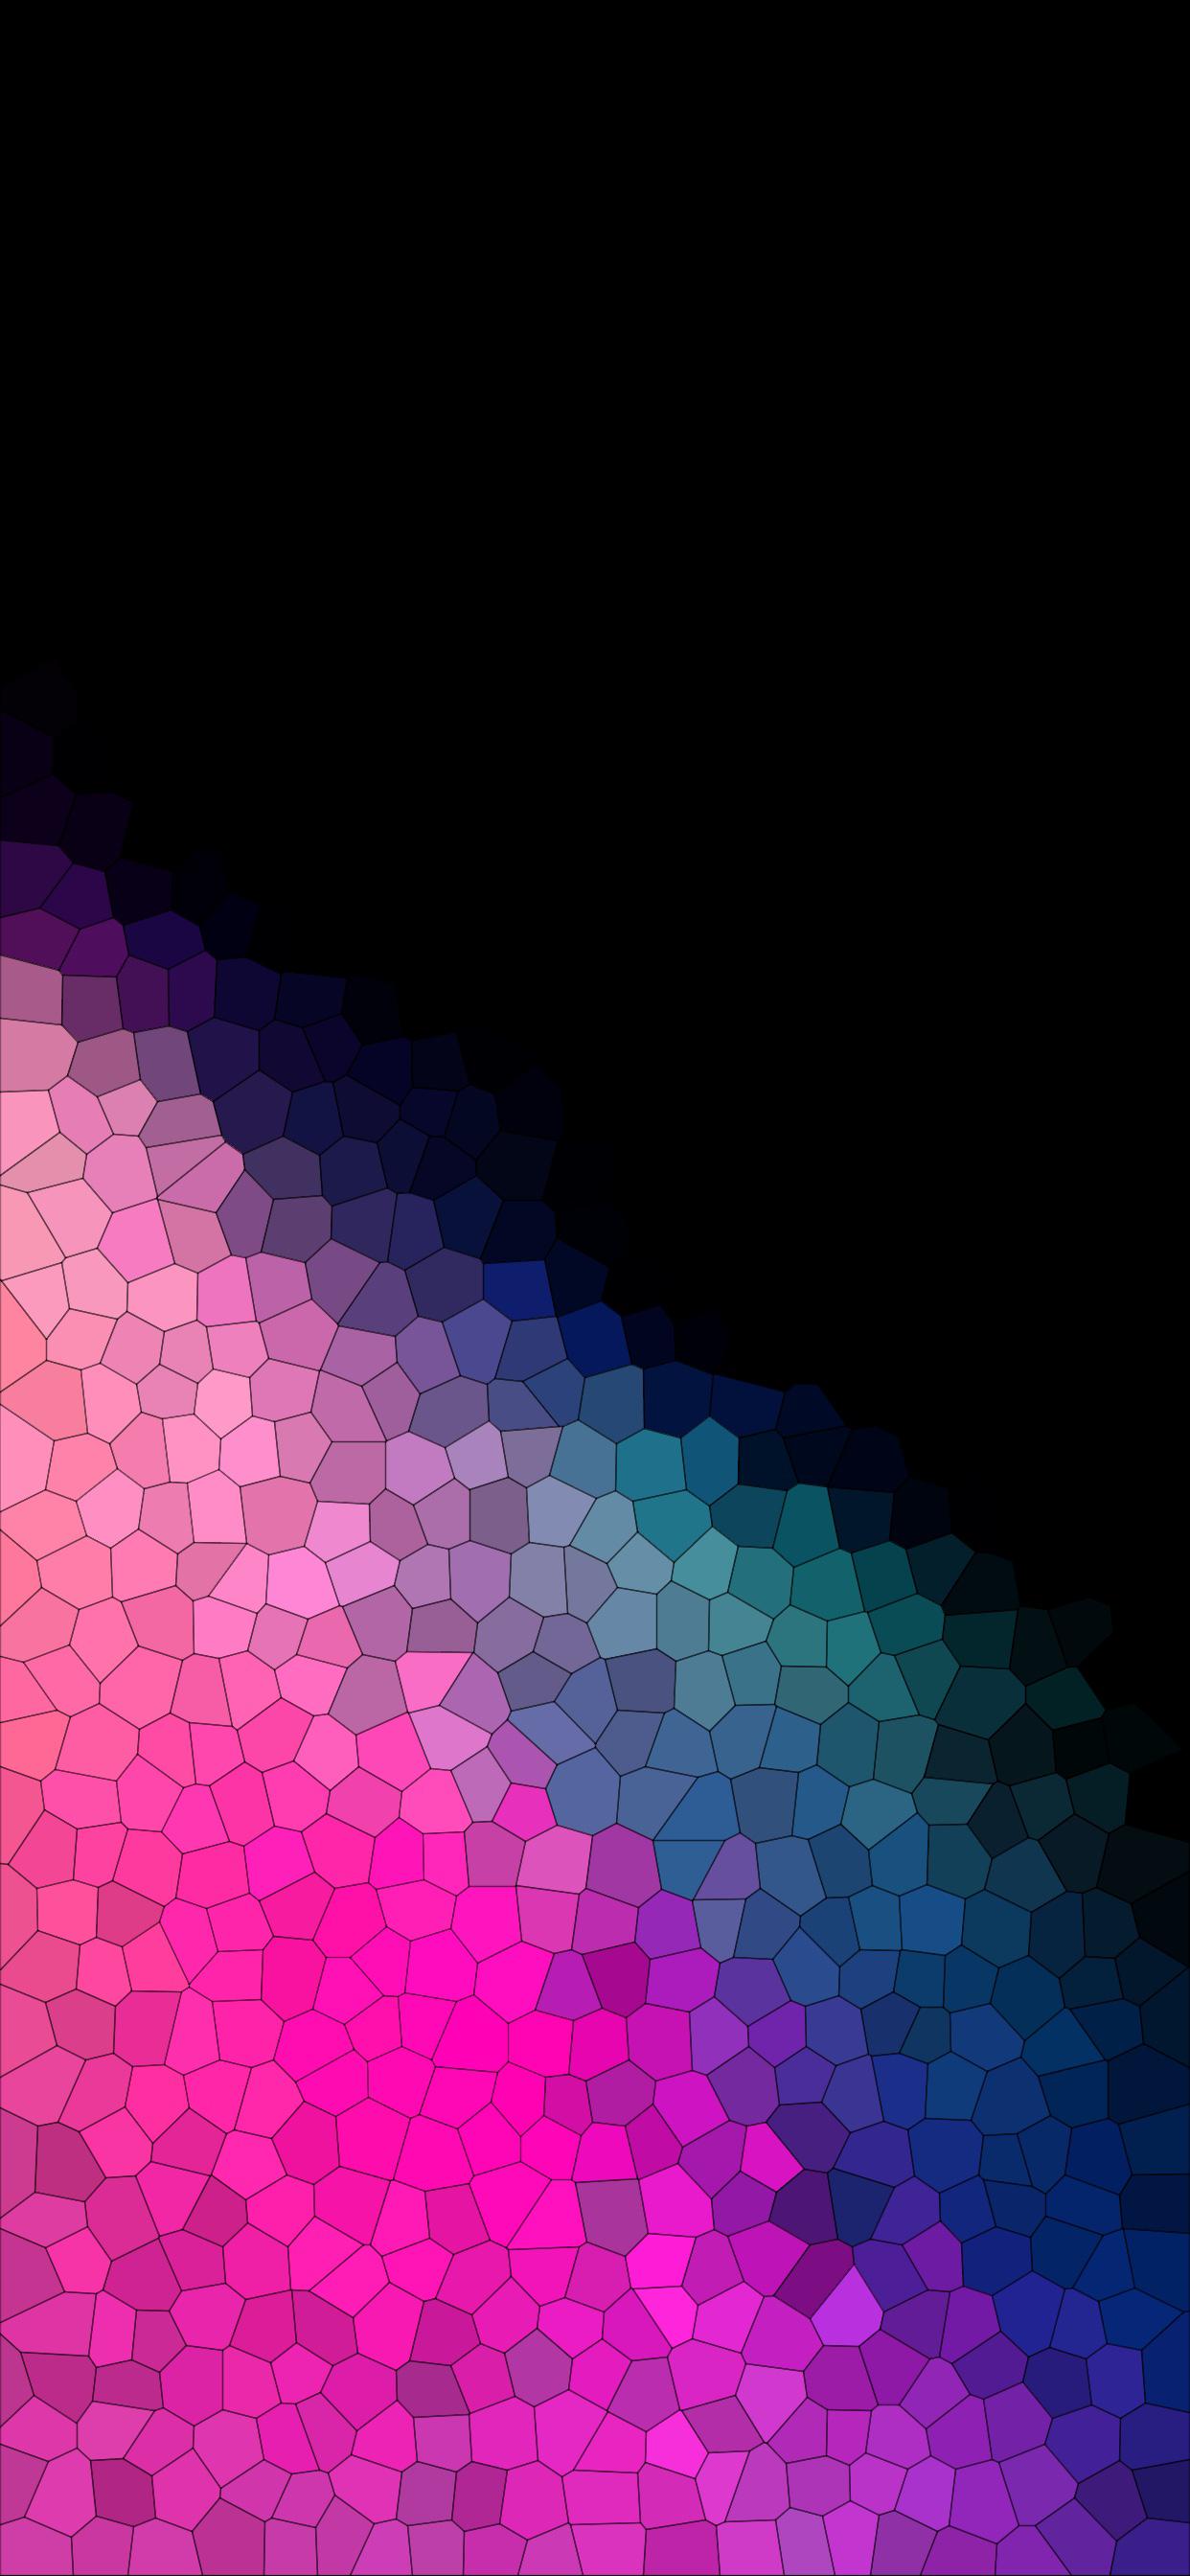 iPhone wallpaper mosaic flat pink Fonds d'écran iPhone du 21/02/2019